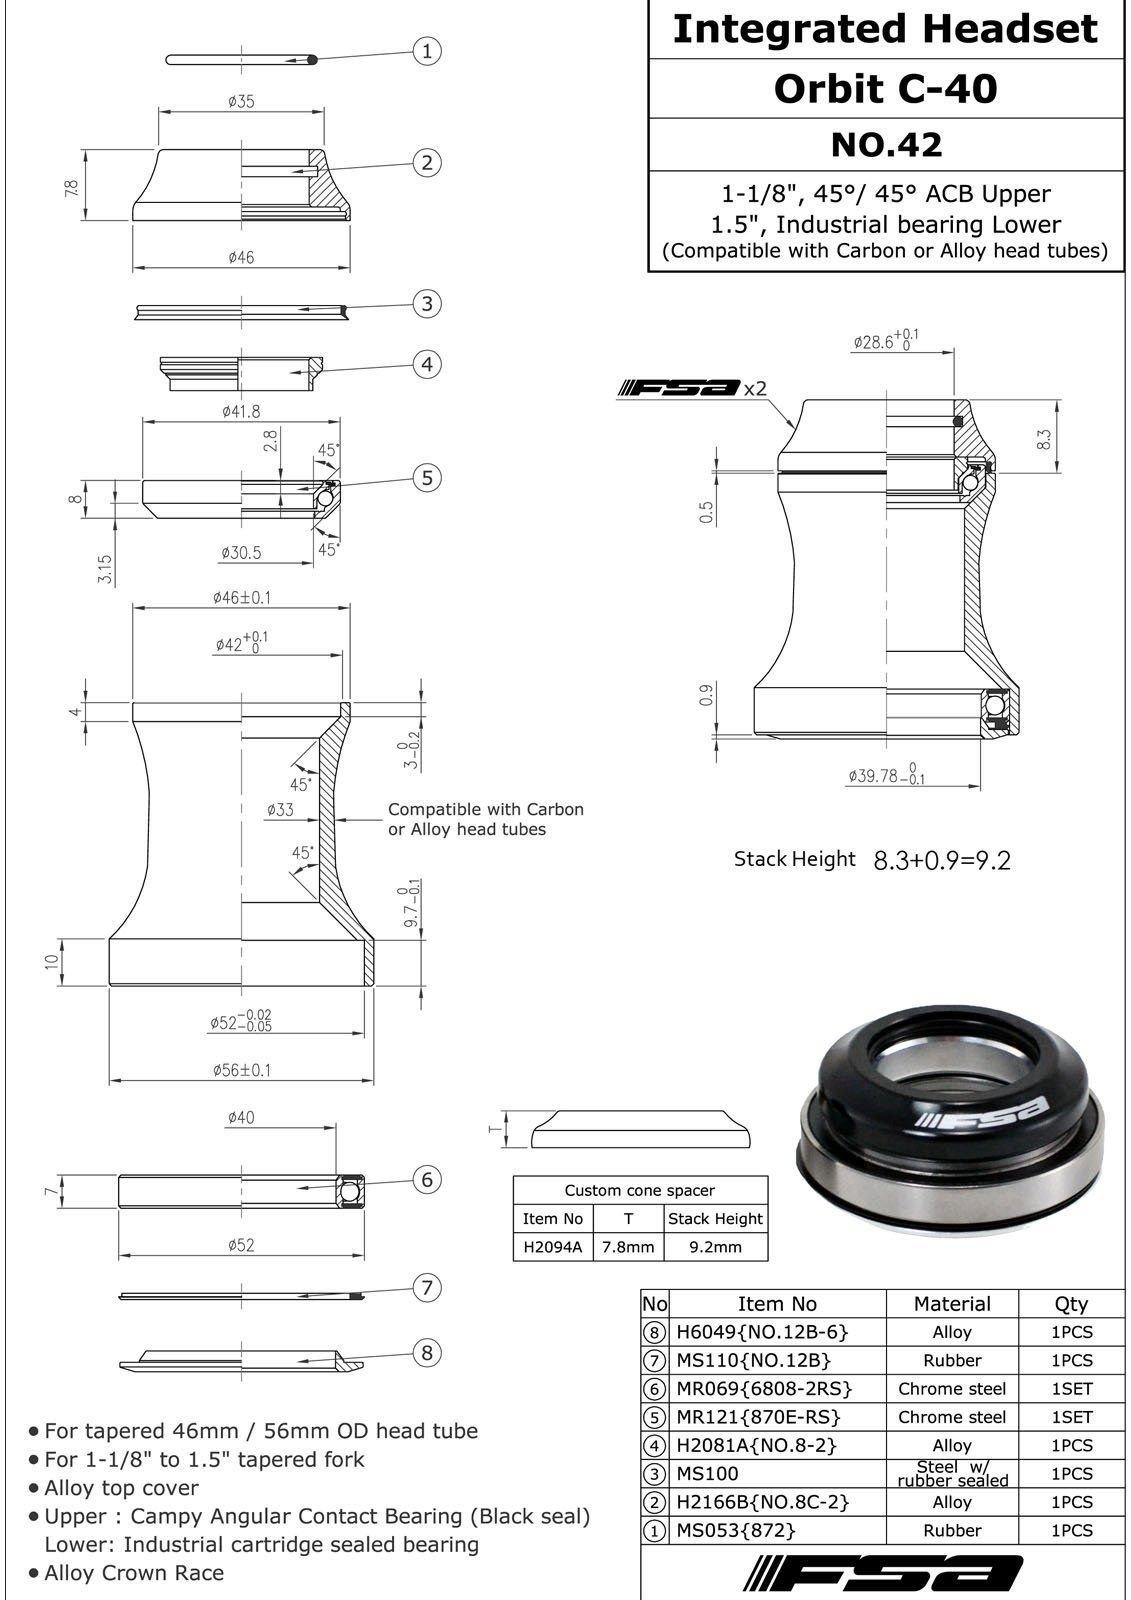 FSA ORBIT C-40 Integrated 1-1/8'' - 1.5'' ID 42/52 mm Tapered Headset, Red #XTE1512